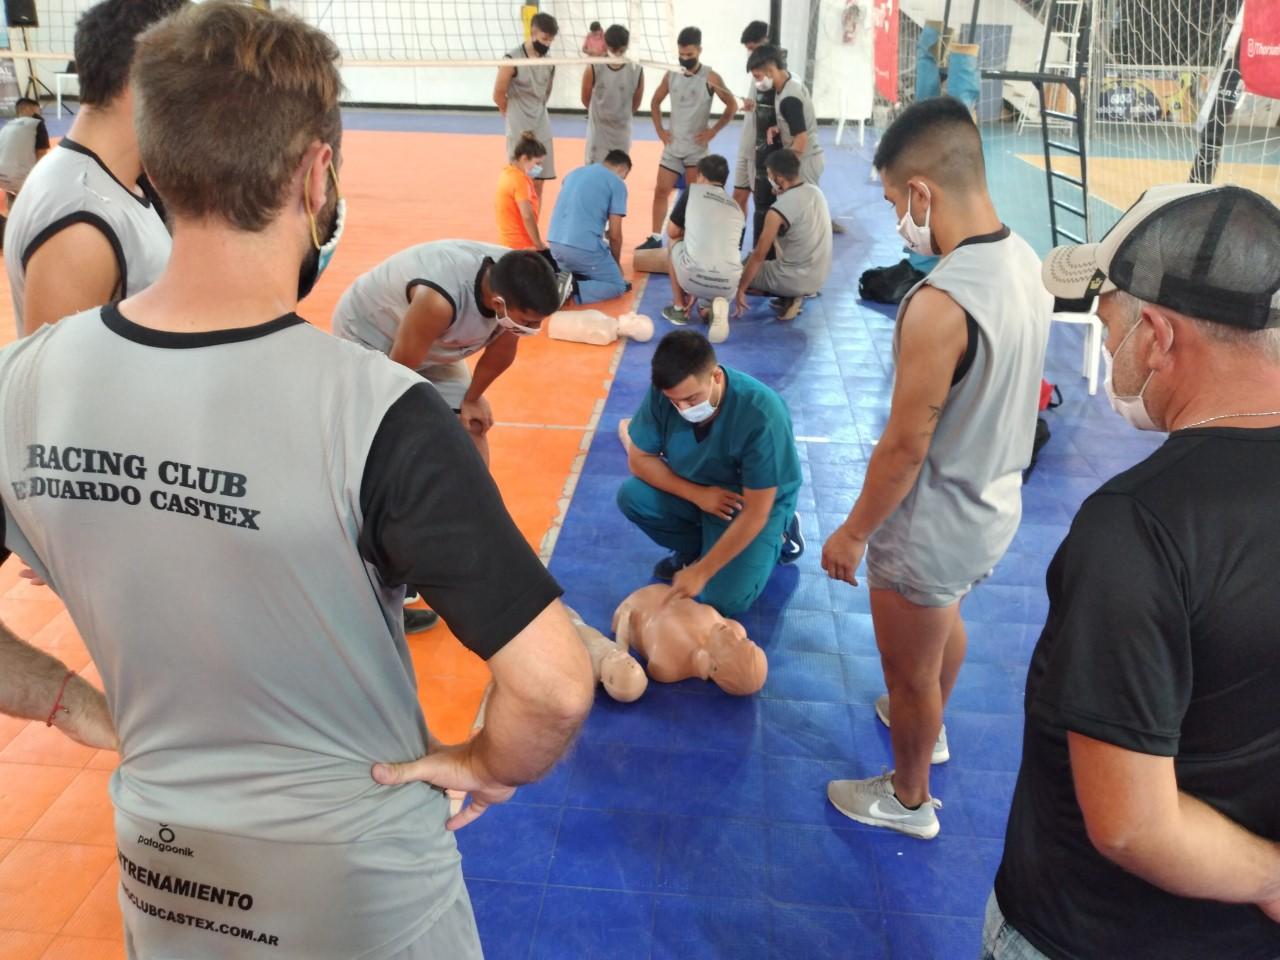 Realizaron jornadas de capacitación de RCP para futbolistas en Eduardo Castex